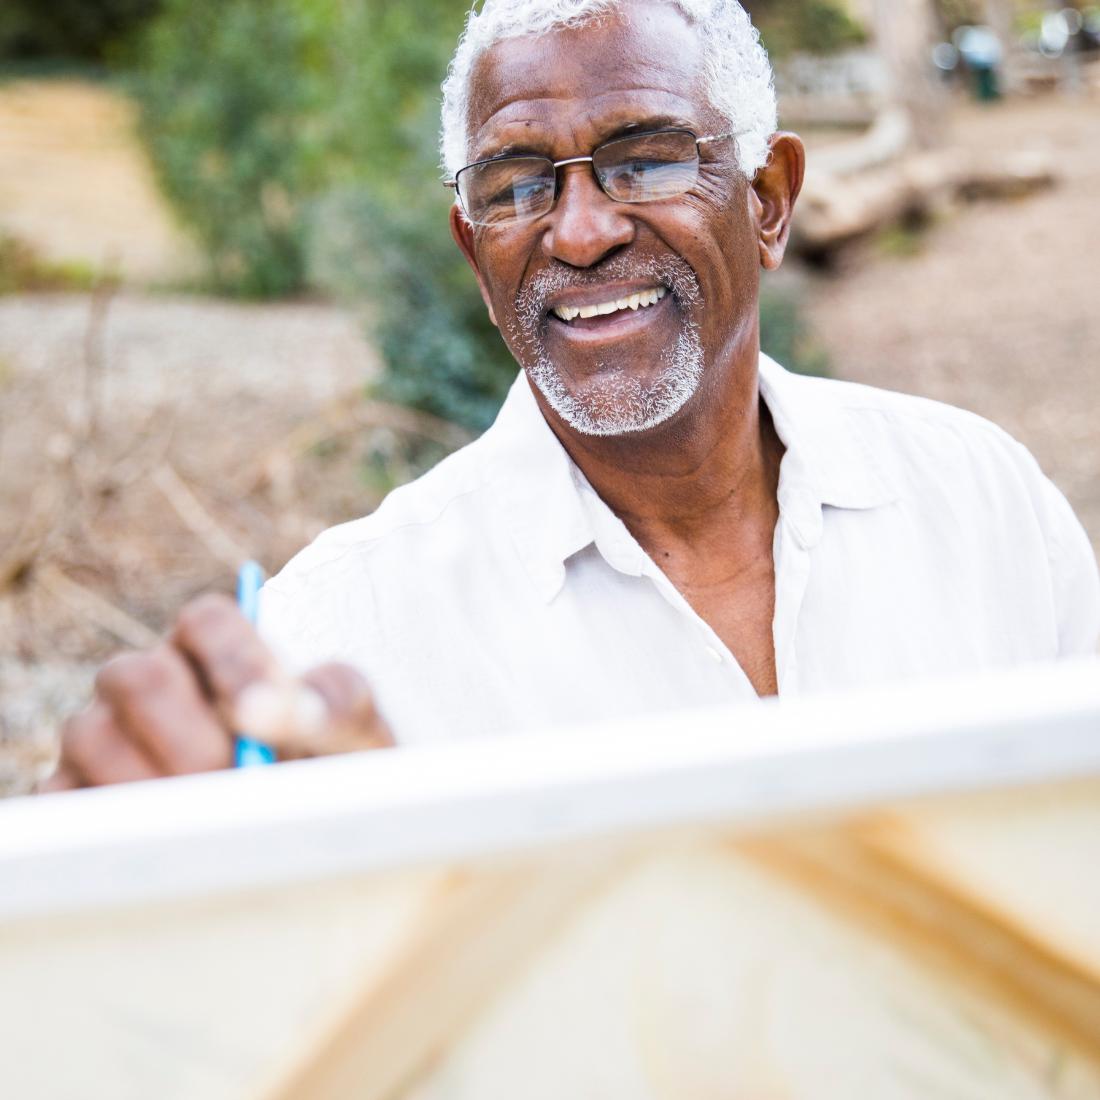 Elderly african american man painting at Valparaiso Senior Village Assisted Living